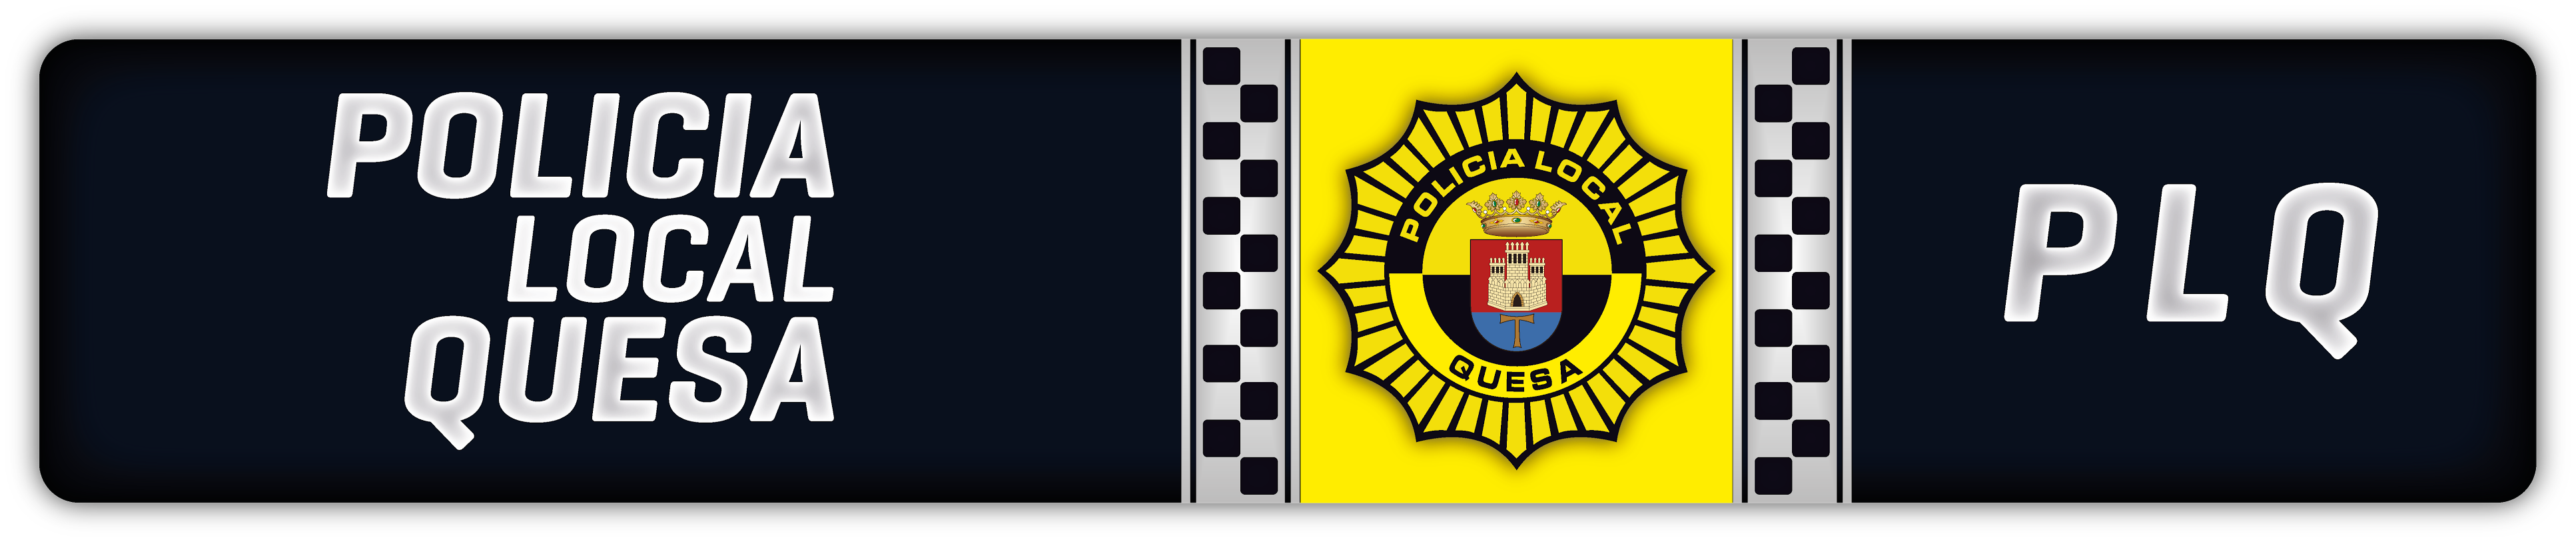 Policía Local de Quesa